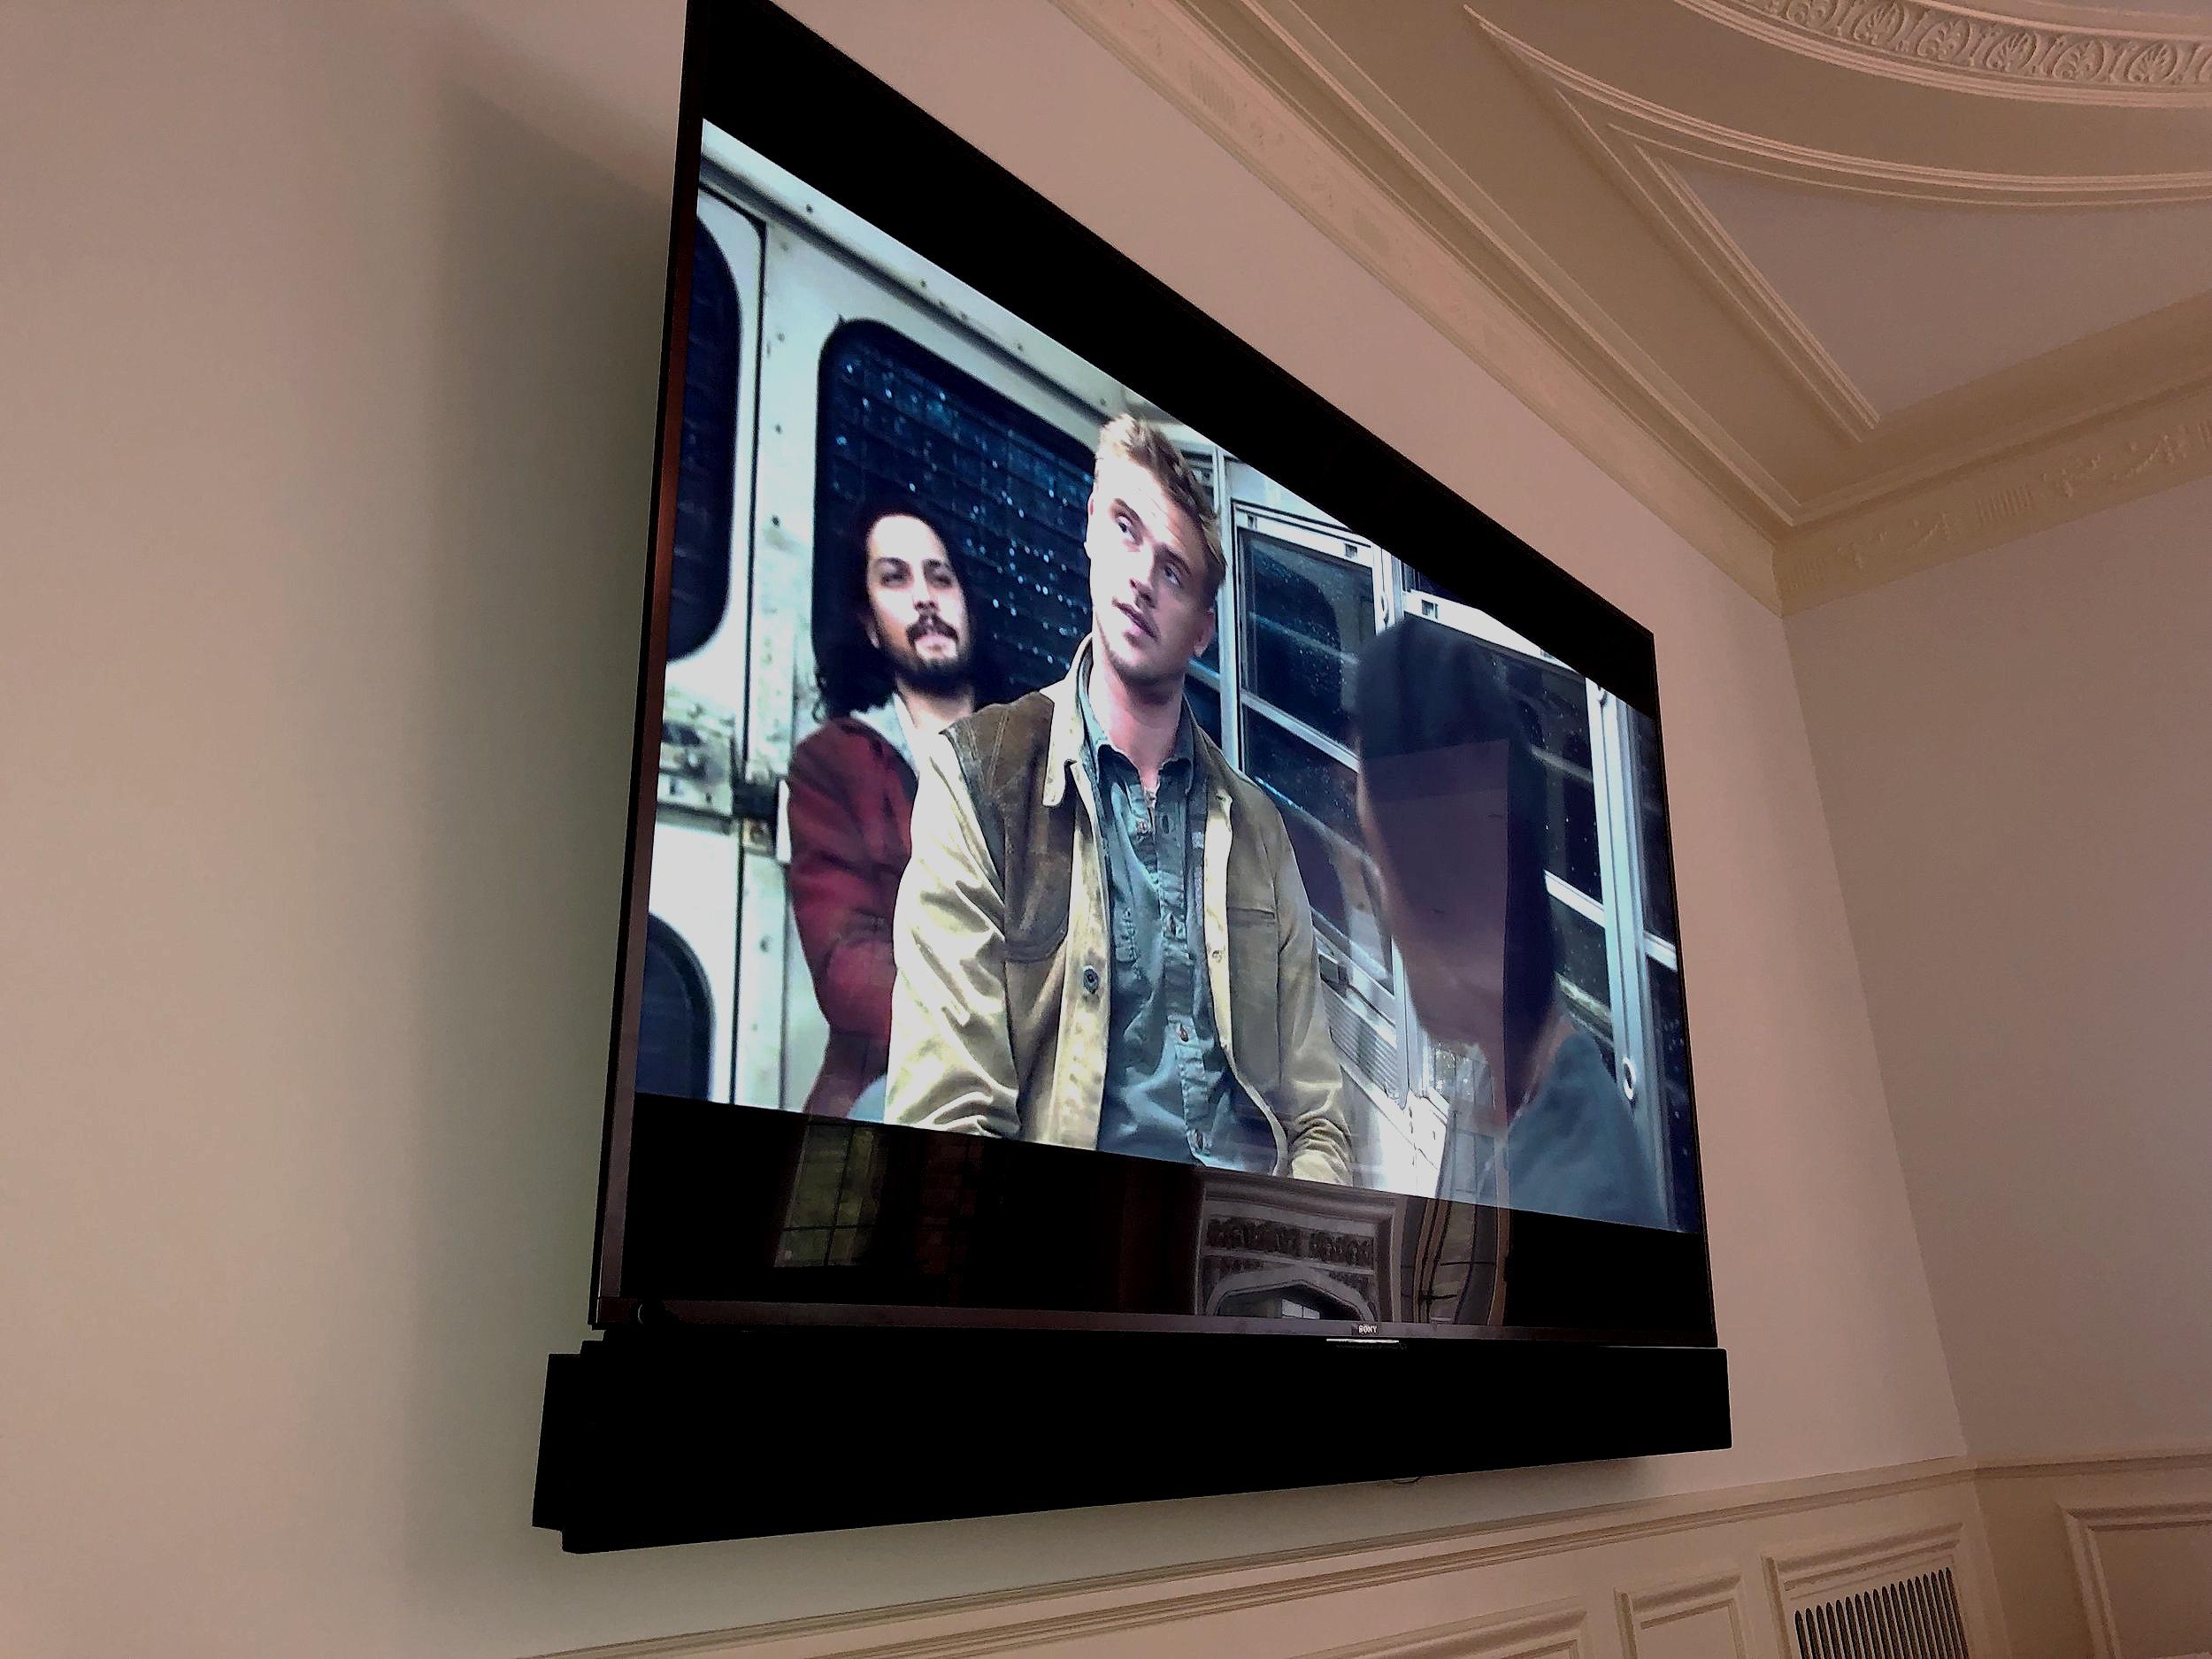 Leon Speakers, custom-fit to TV audiophile quality soundbars, superb fit and finish.